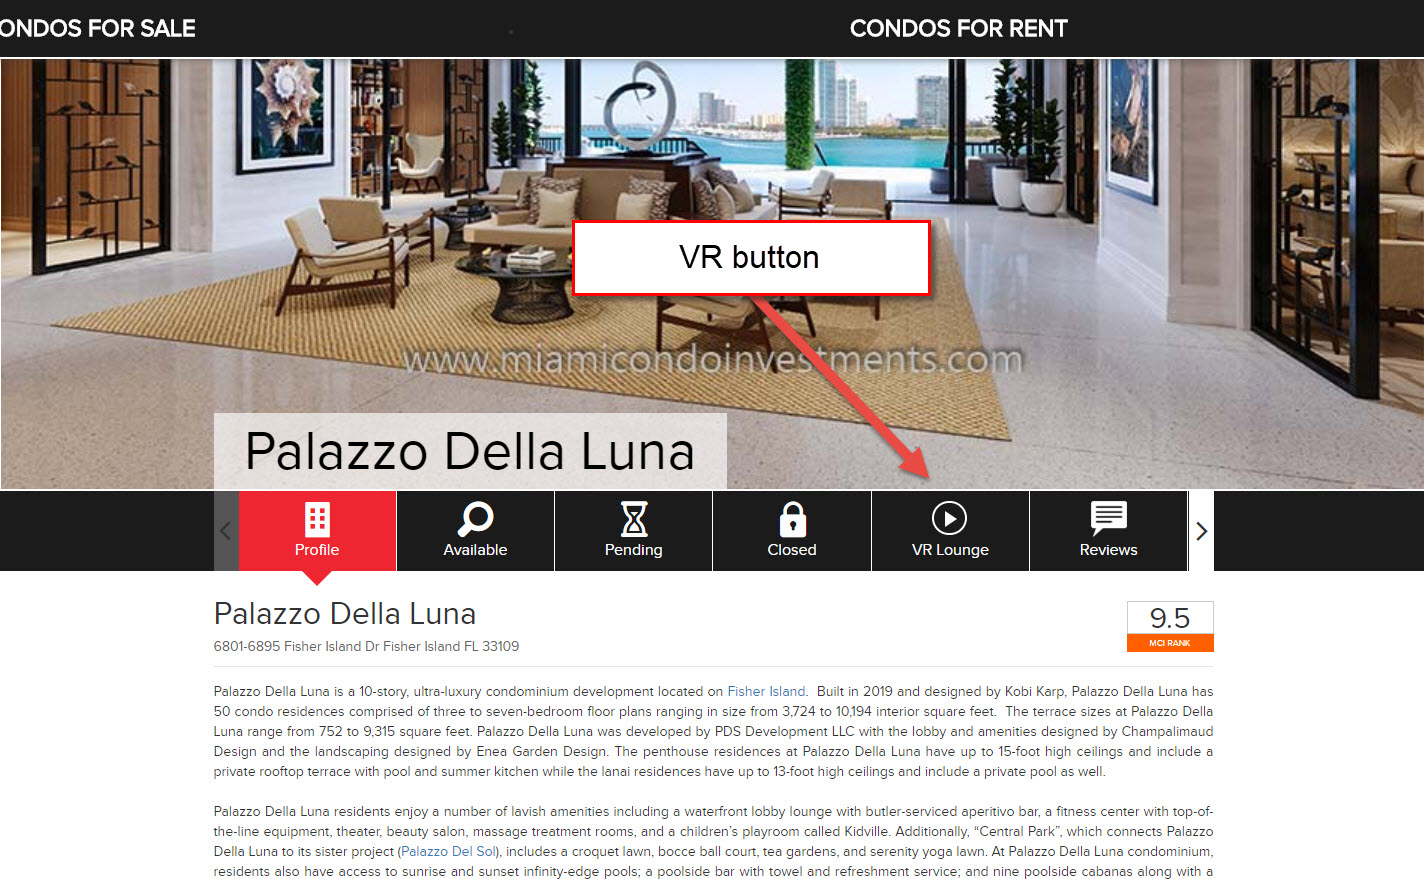 virtual reality button on Miami Condo Investments website